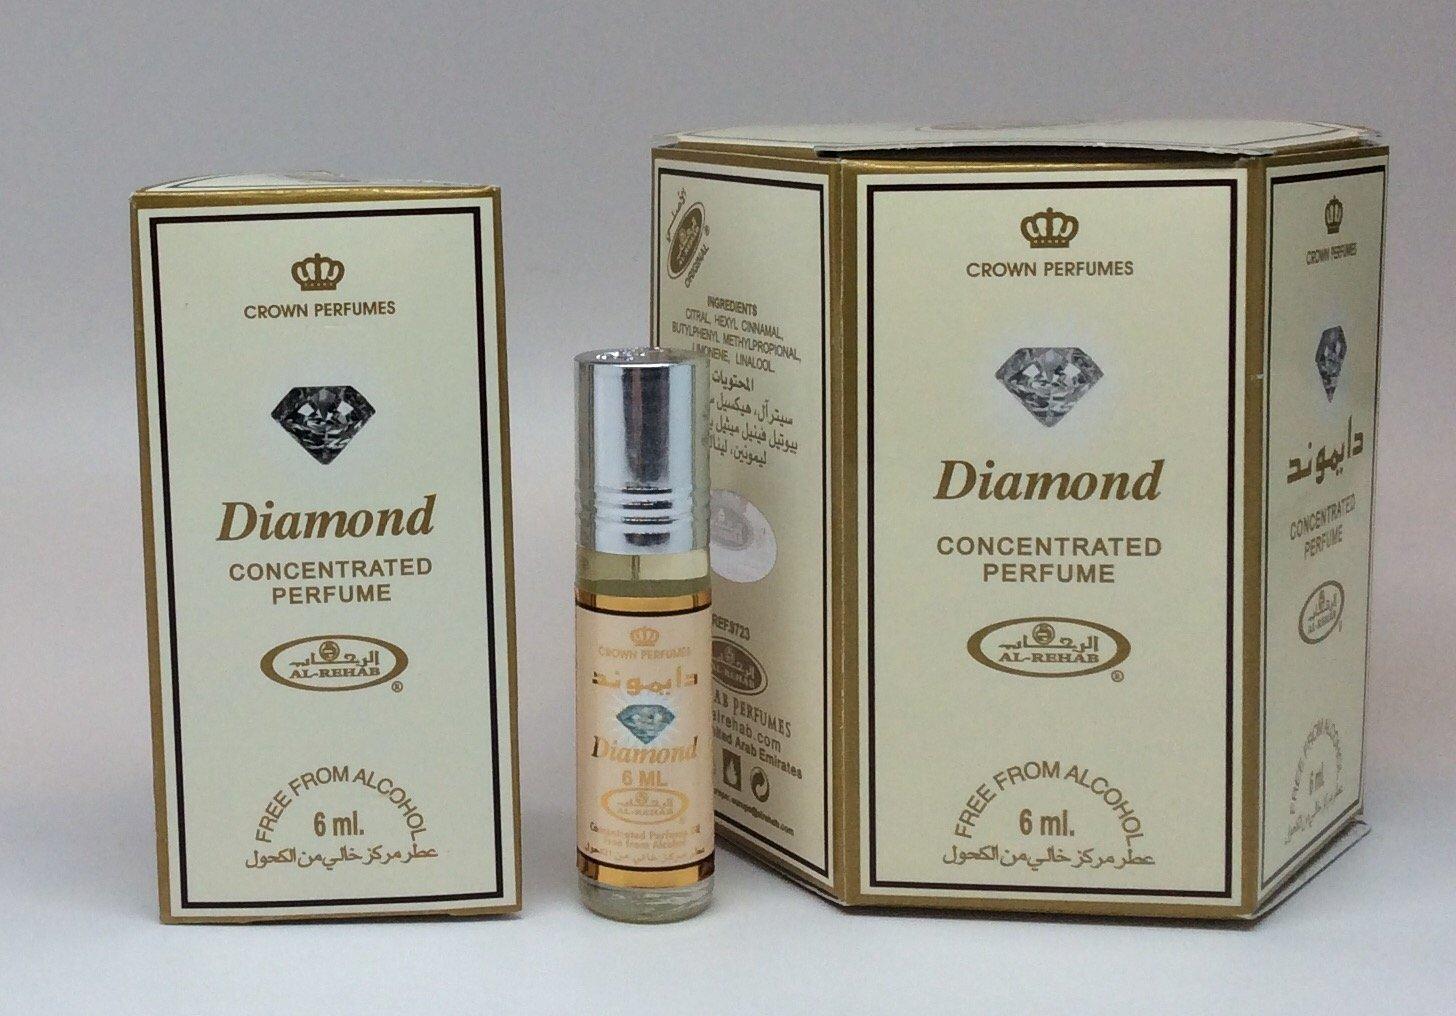 87fd40678 Amazon.com: Diamond - 6ml (.2oz) Roll-on Perfume Oil by AlRehab - 24 pack:  Health & Personal Care